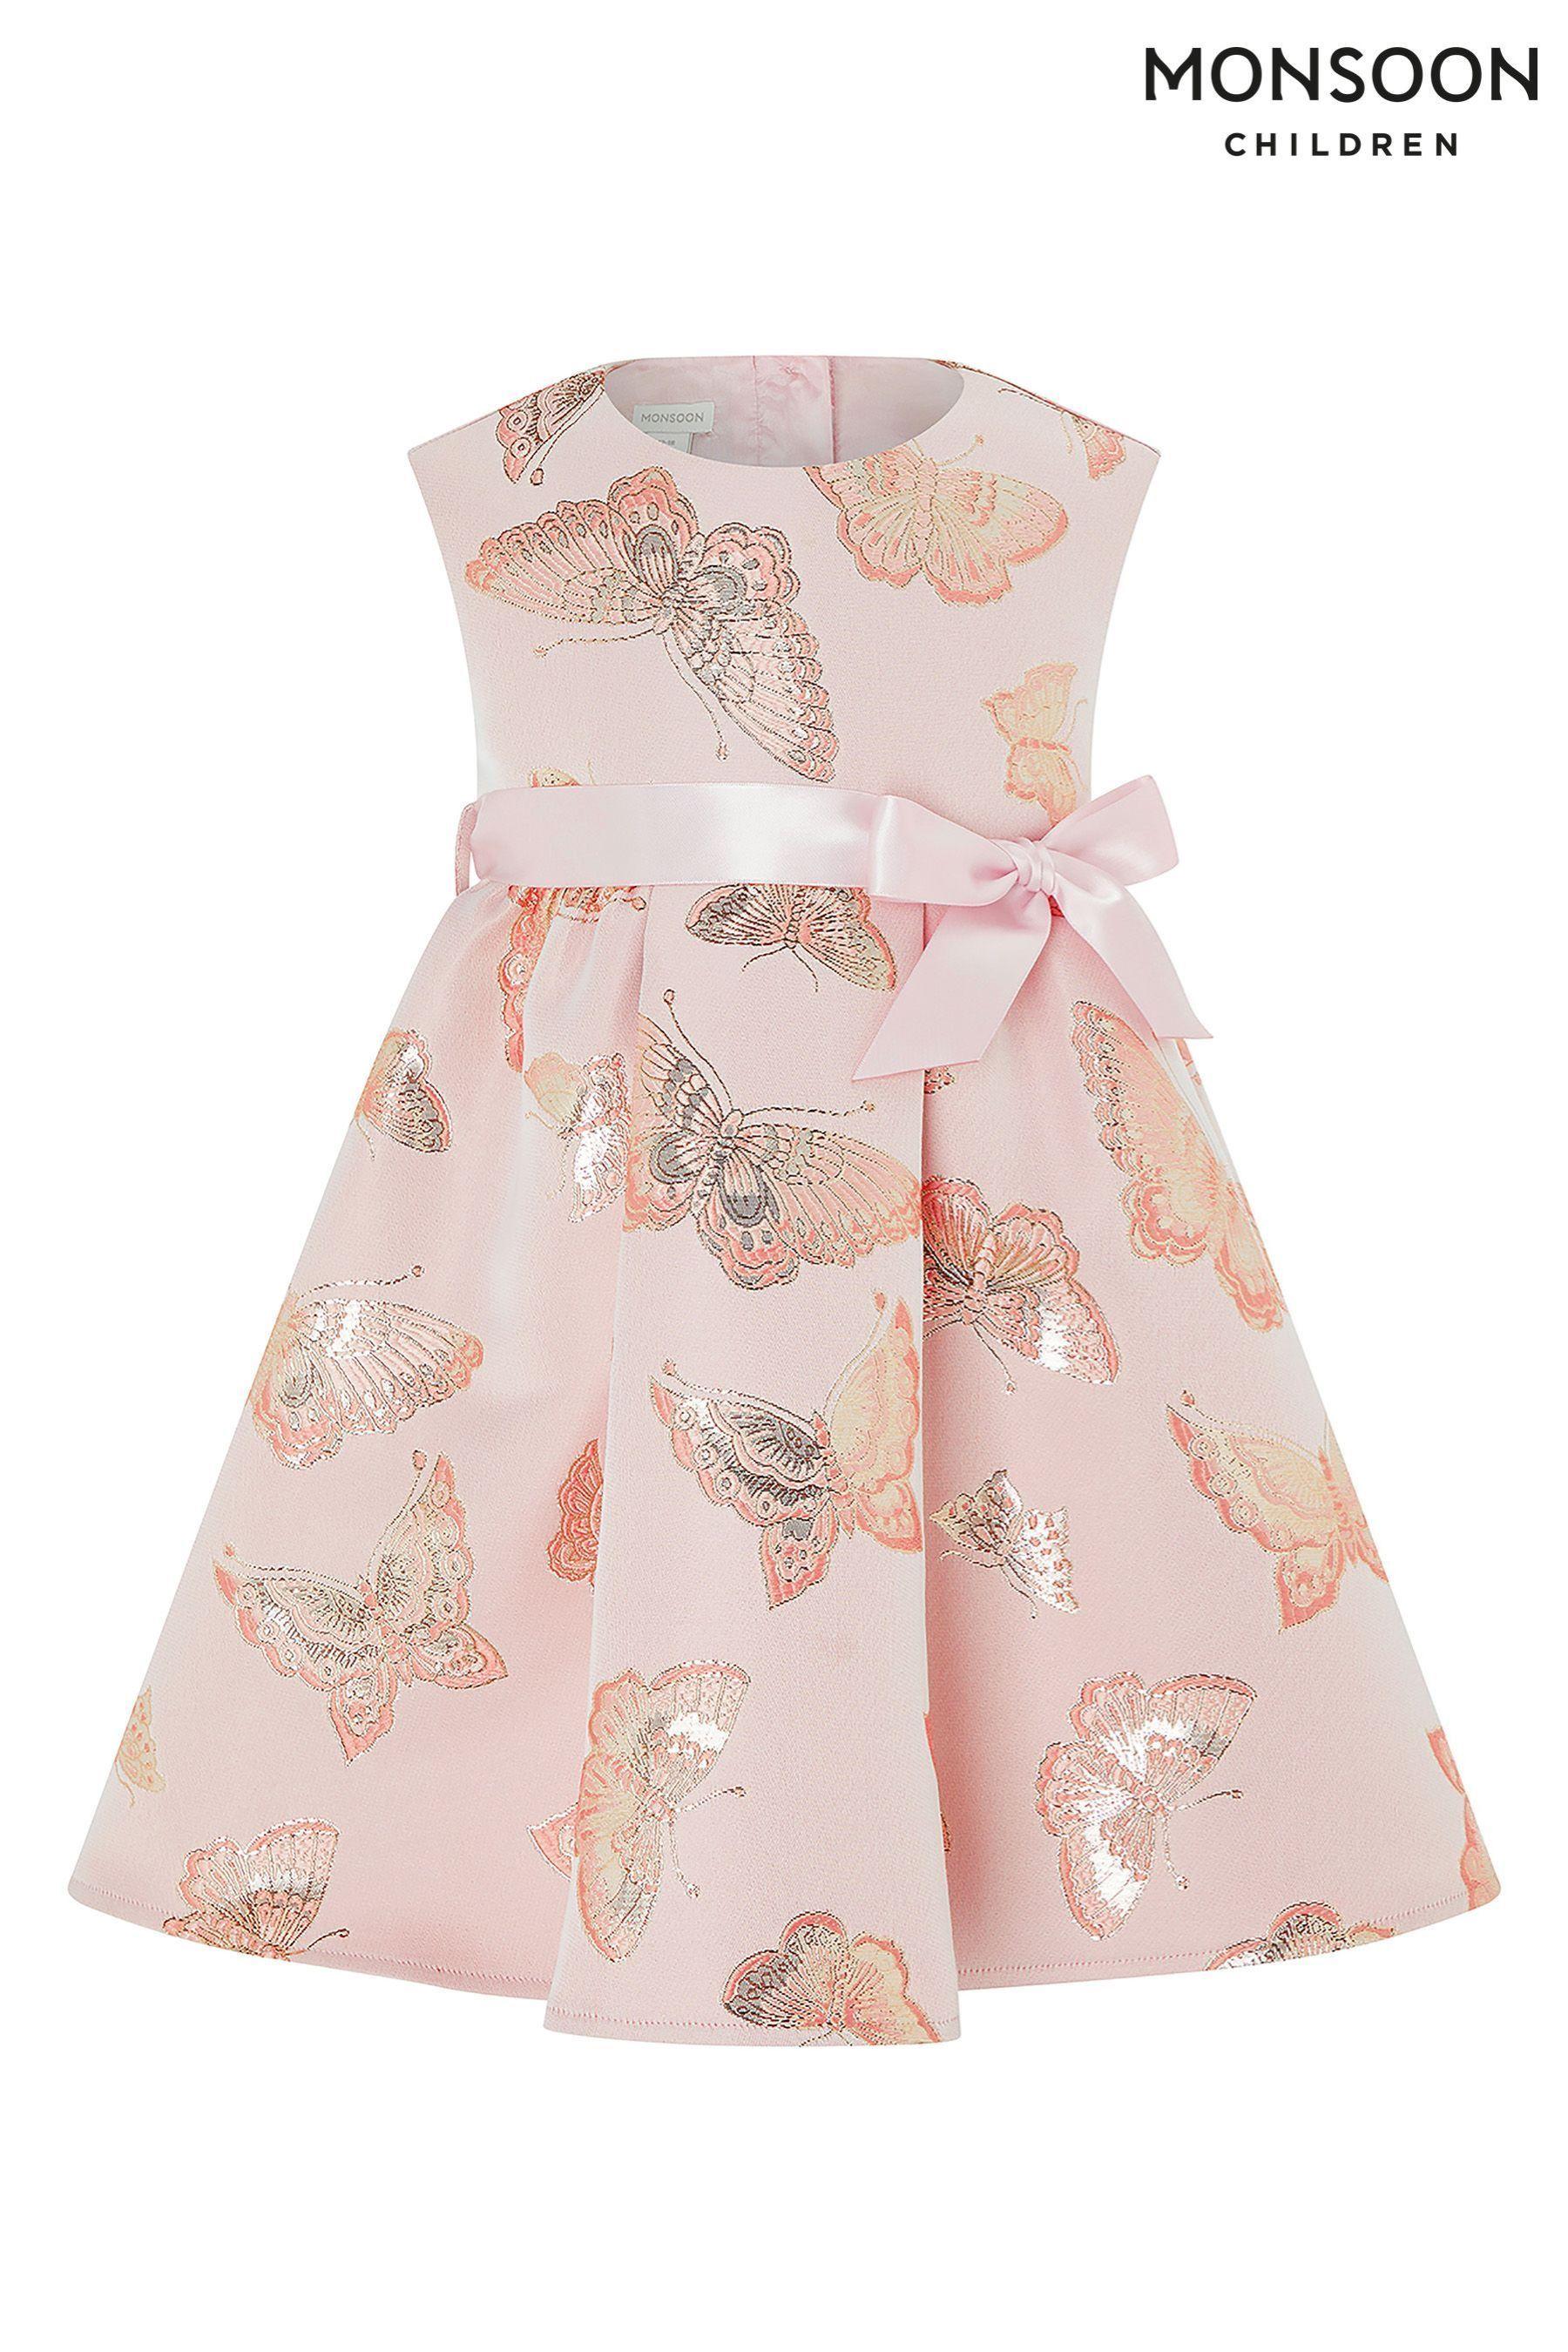 7164a821b45bd Girls Monsoon Pink Baby Nora Butterfly Jacquard Dress - Pink | kids ...